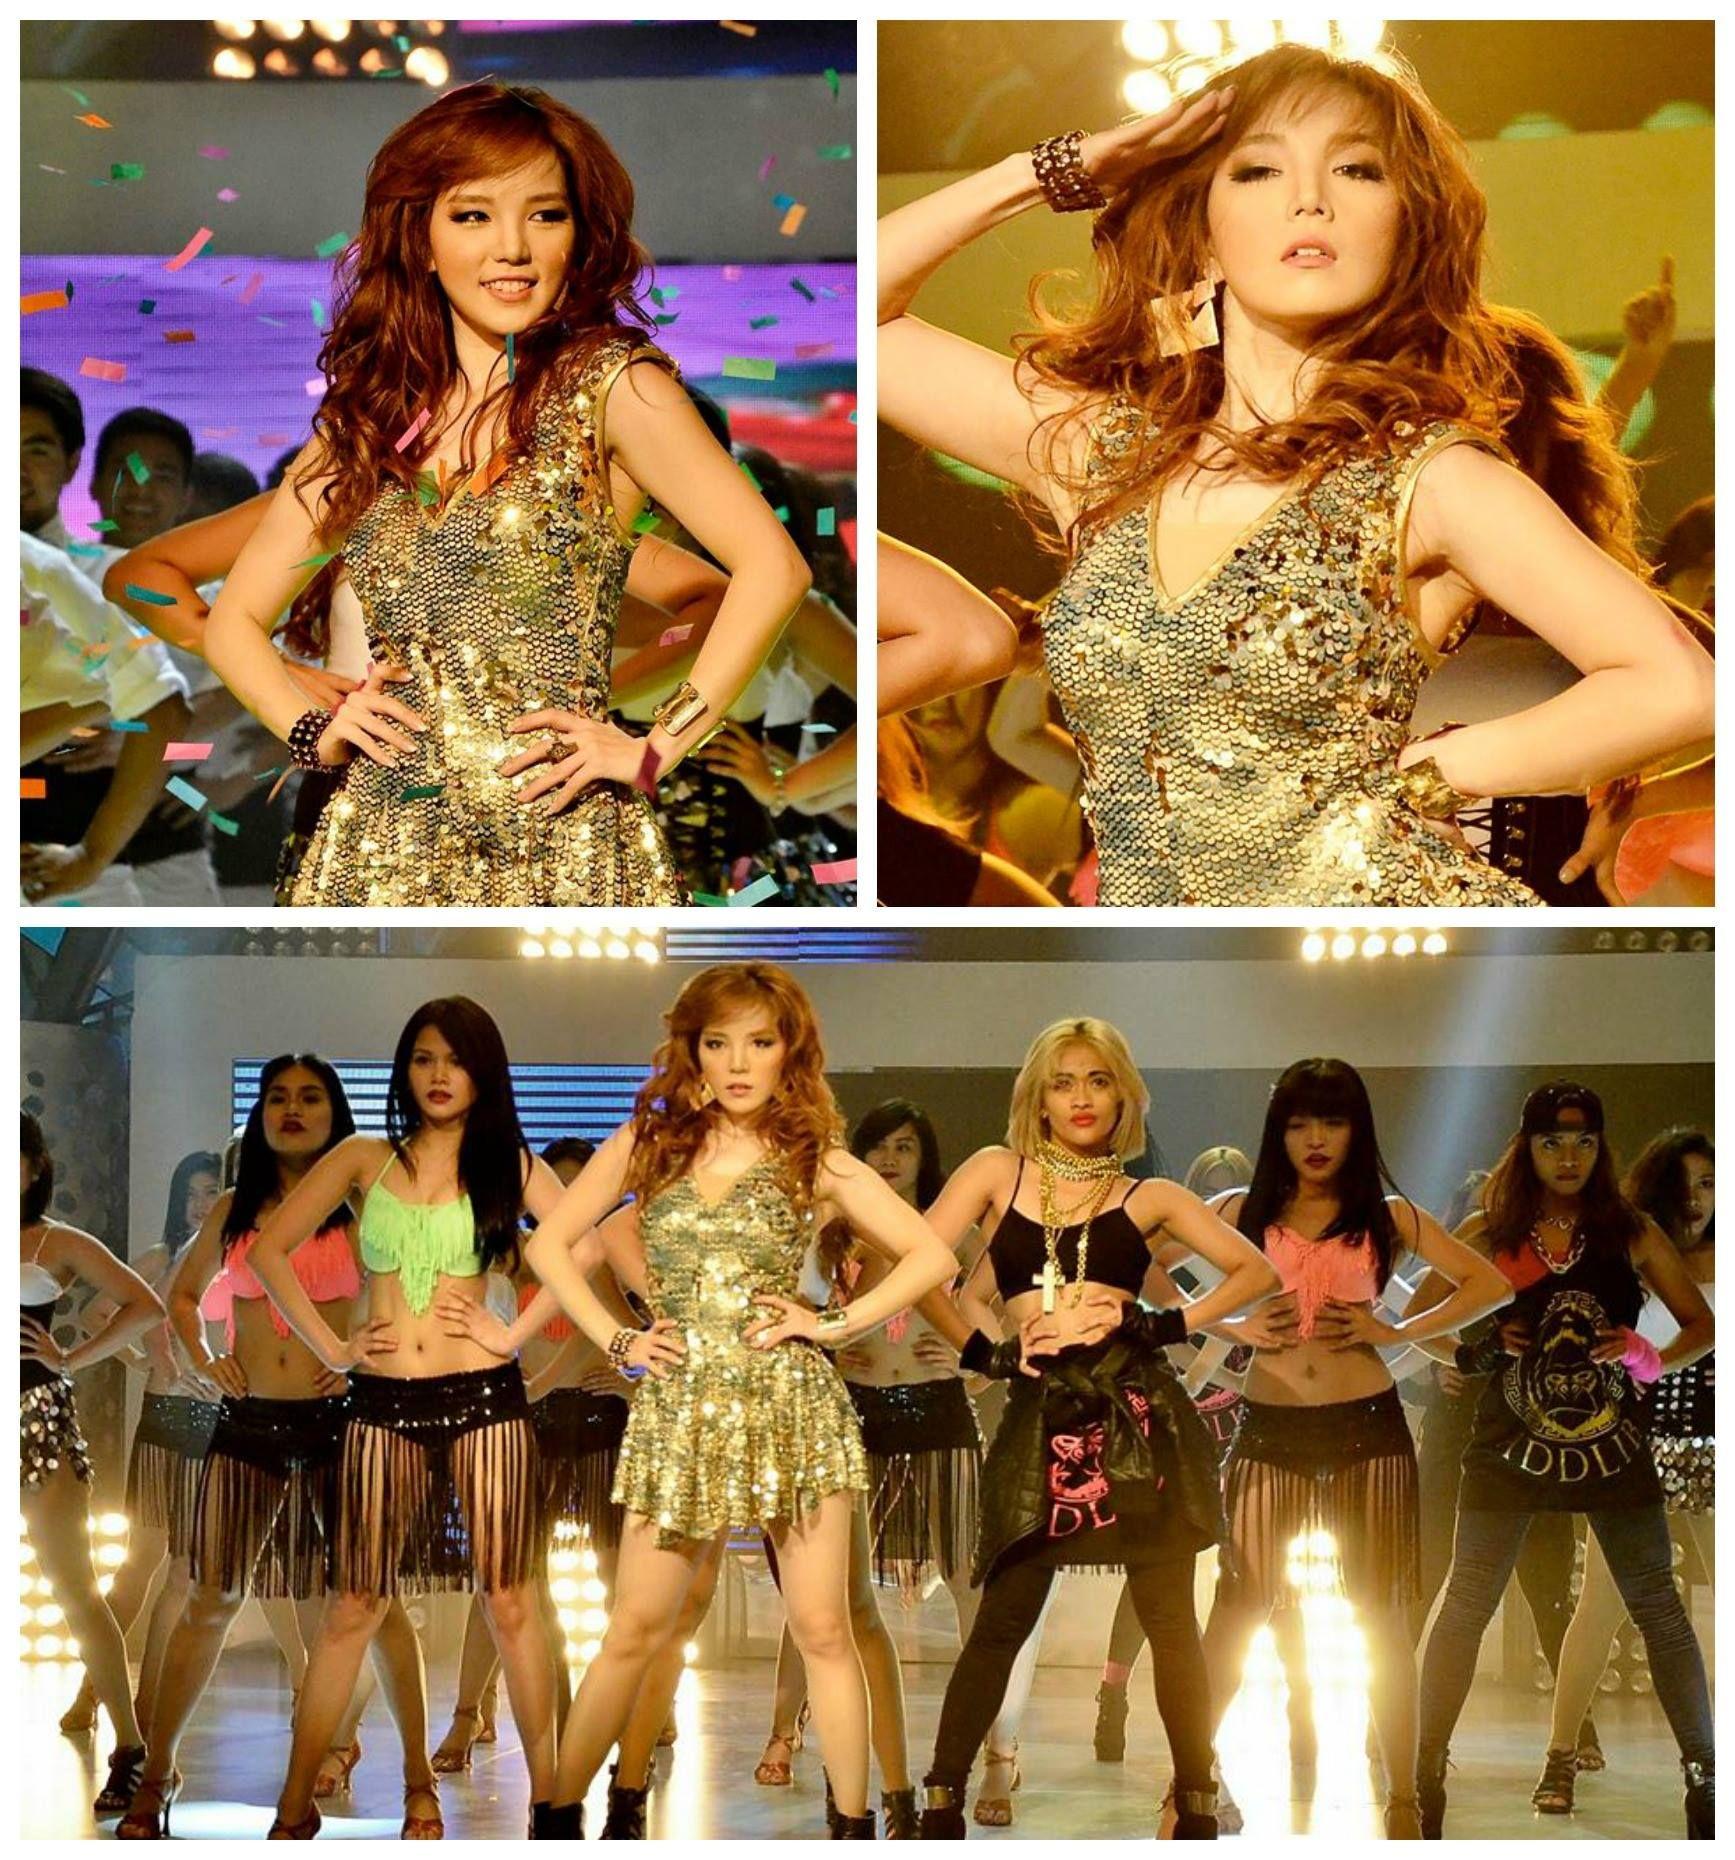 Dasuri Choi From Backup Dancer To Dancing Diva Dancer Dance Beauty Girl